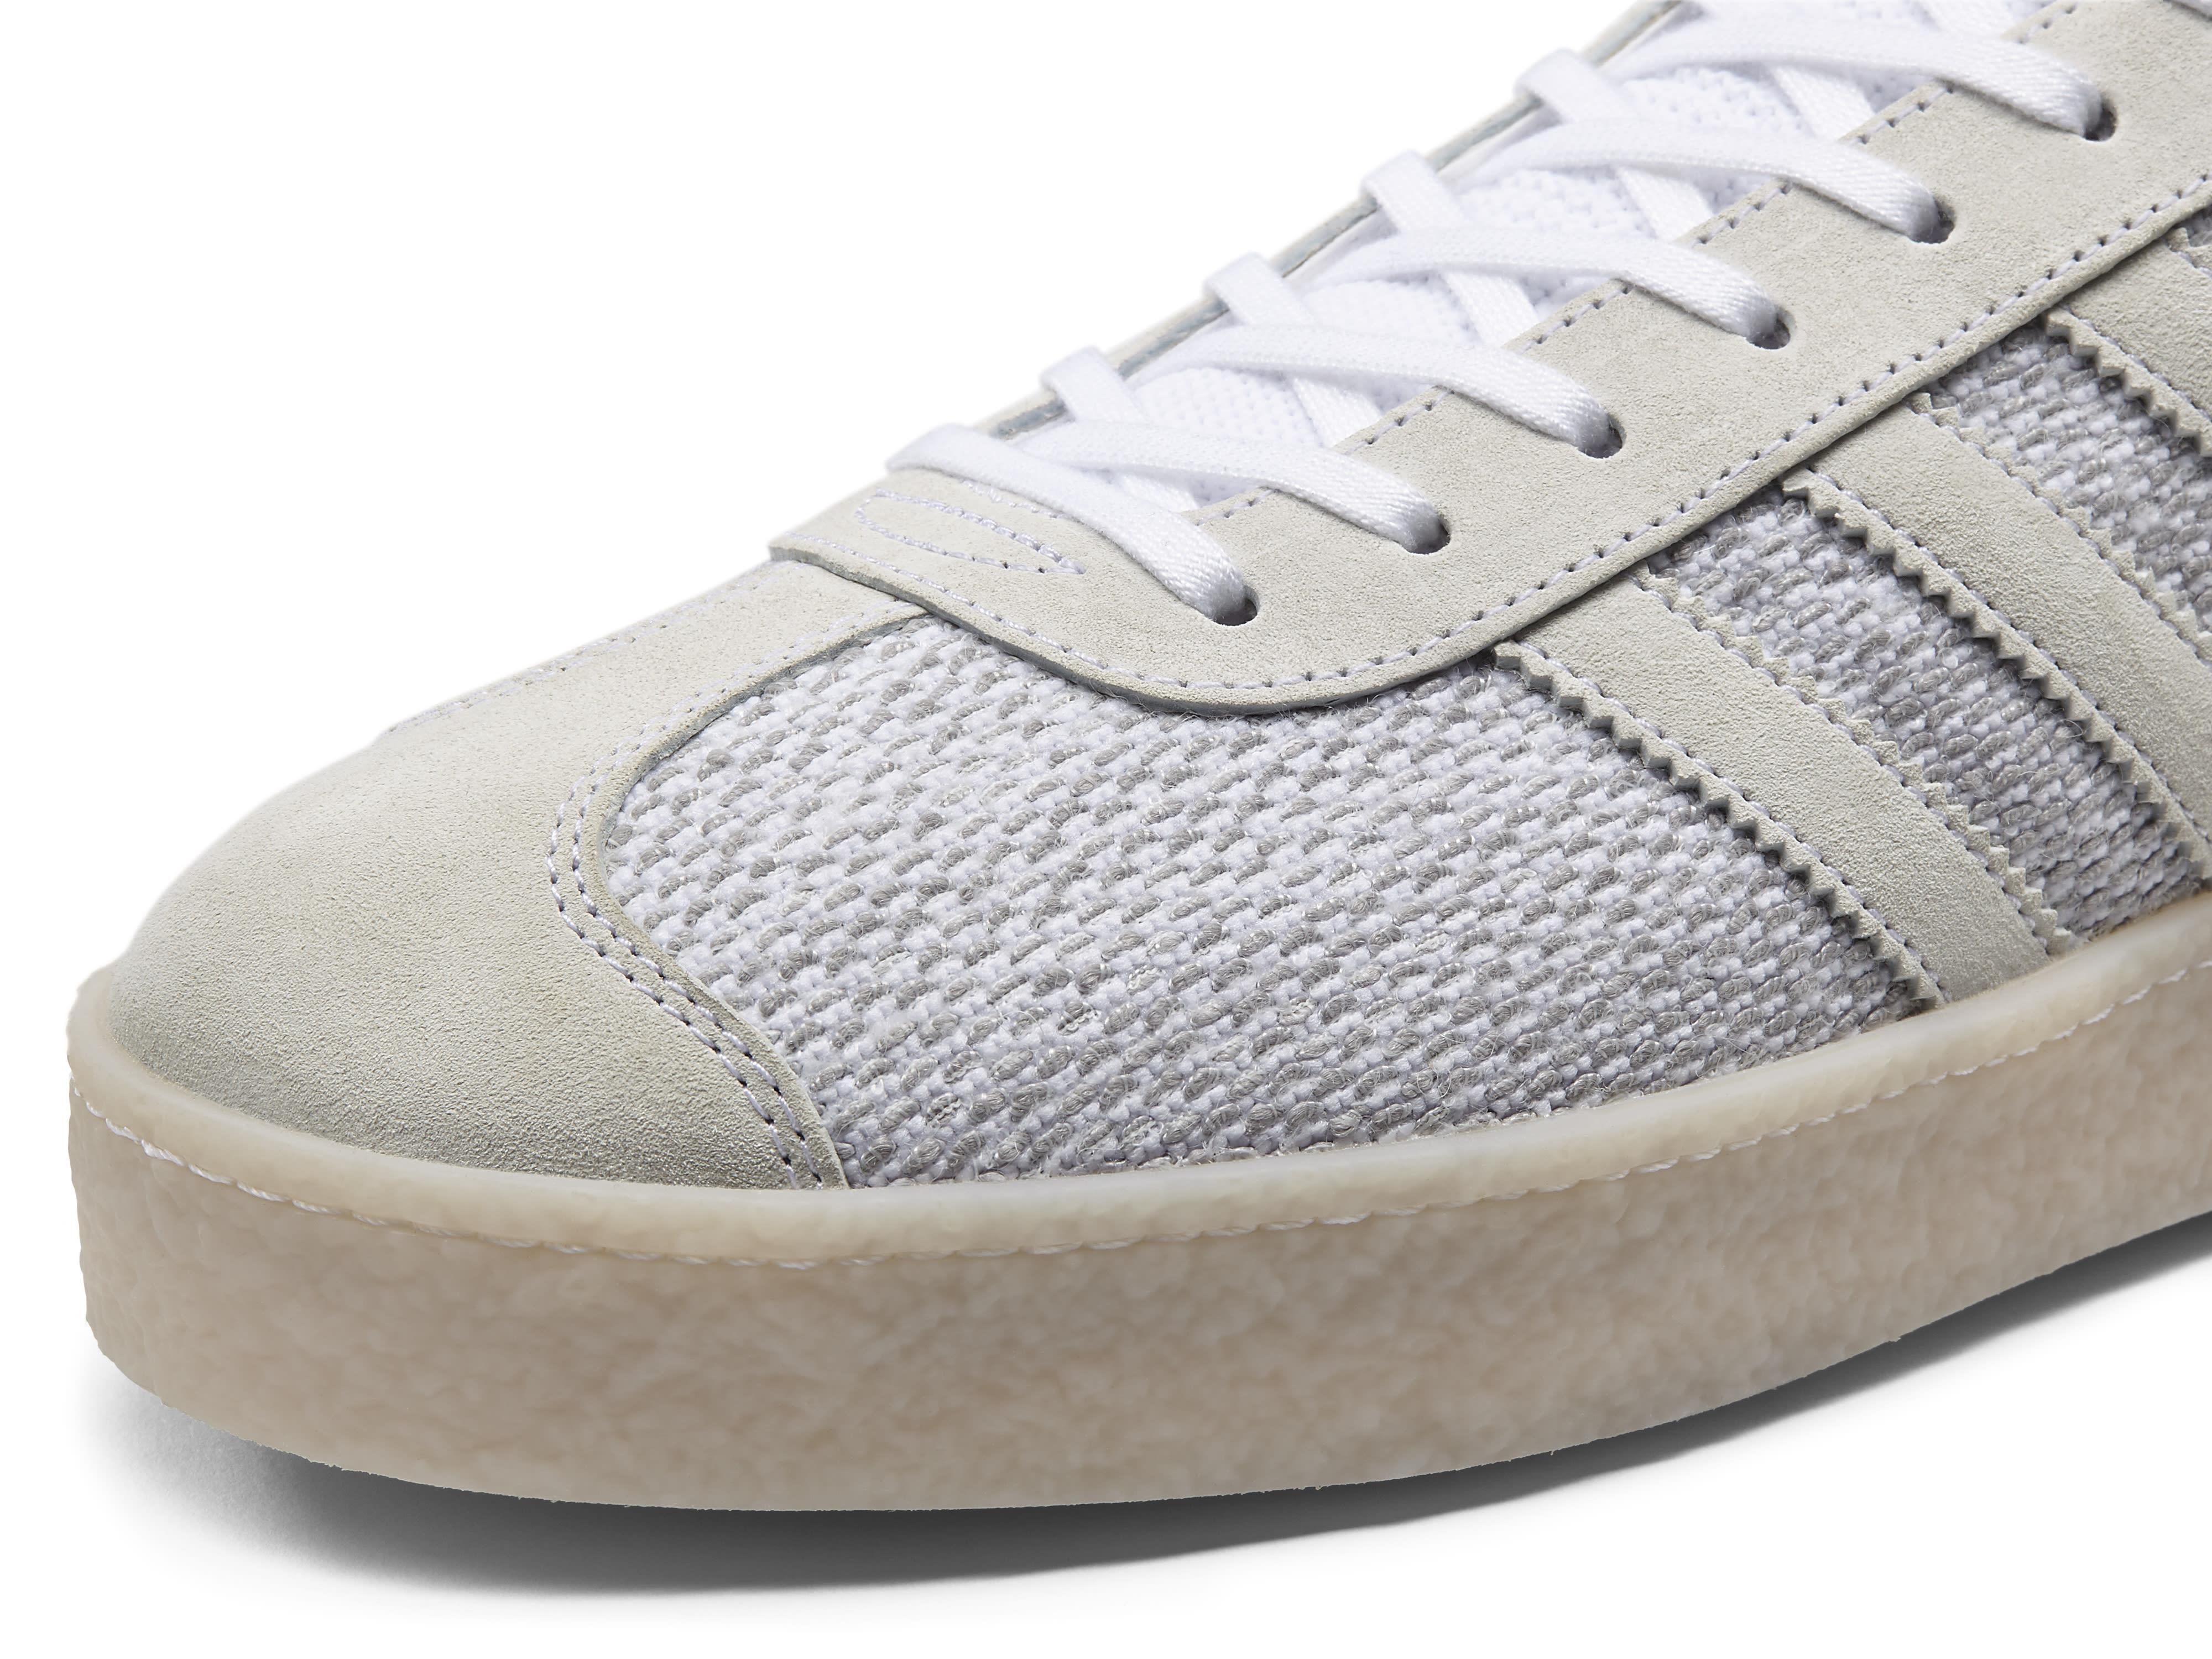 Juice x Adidas Consortium Gazelle DB1628 (Toe)